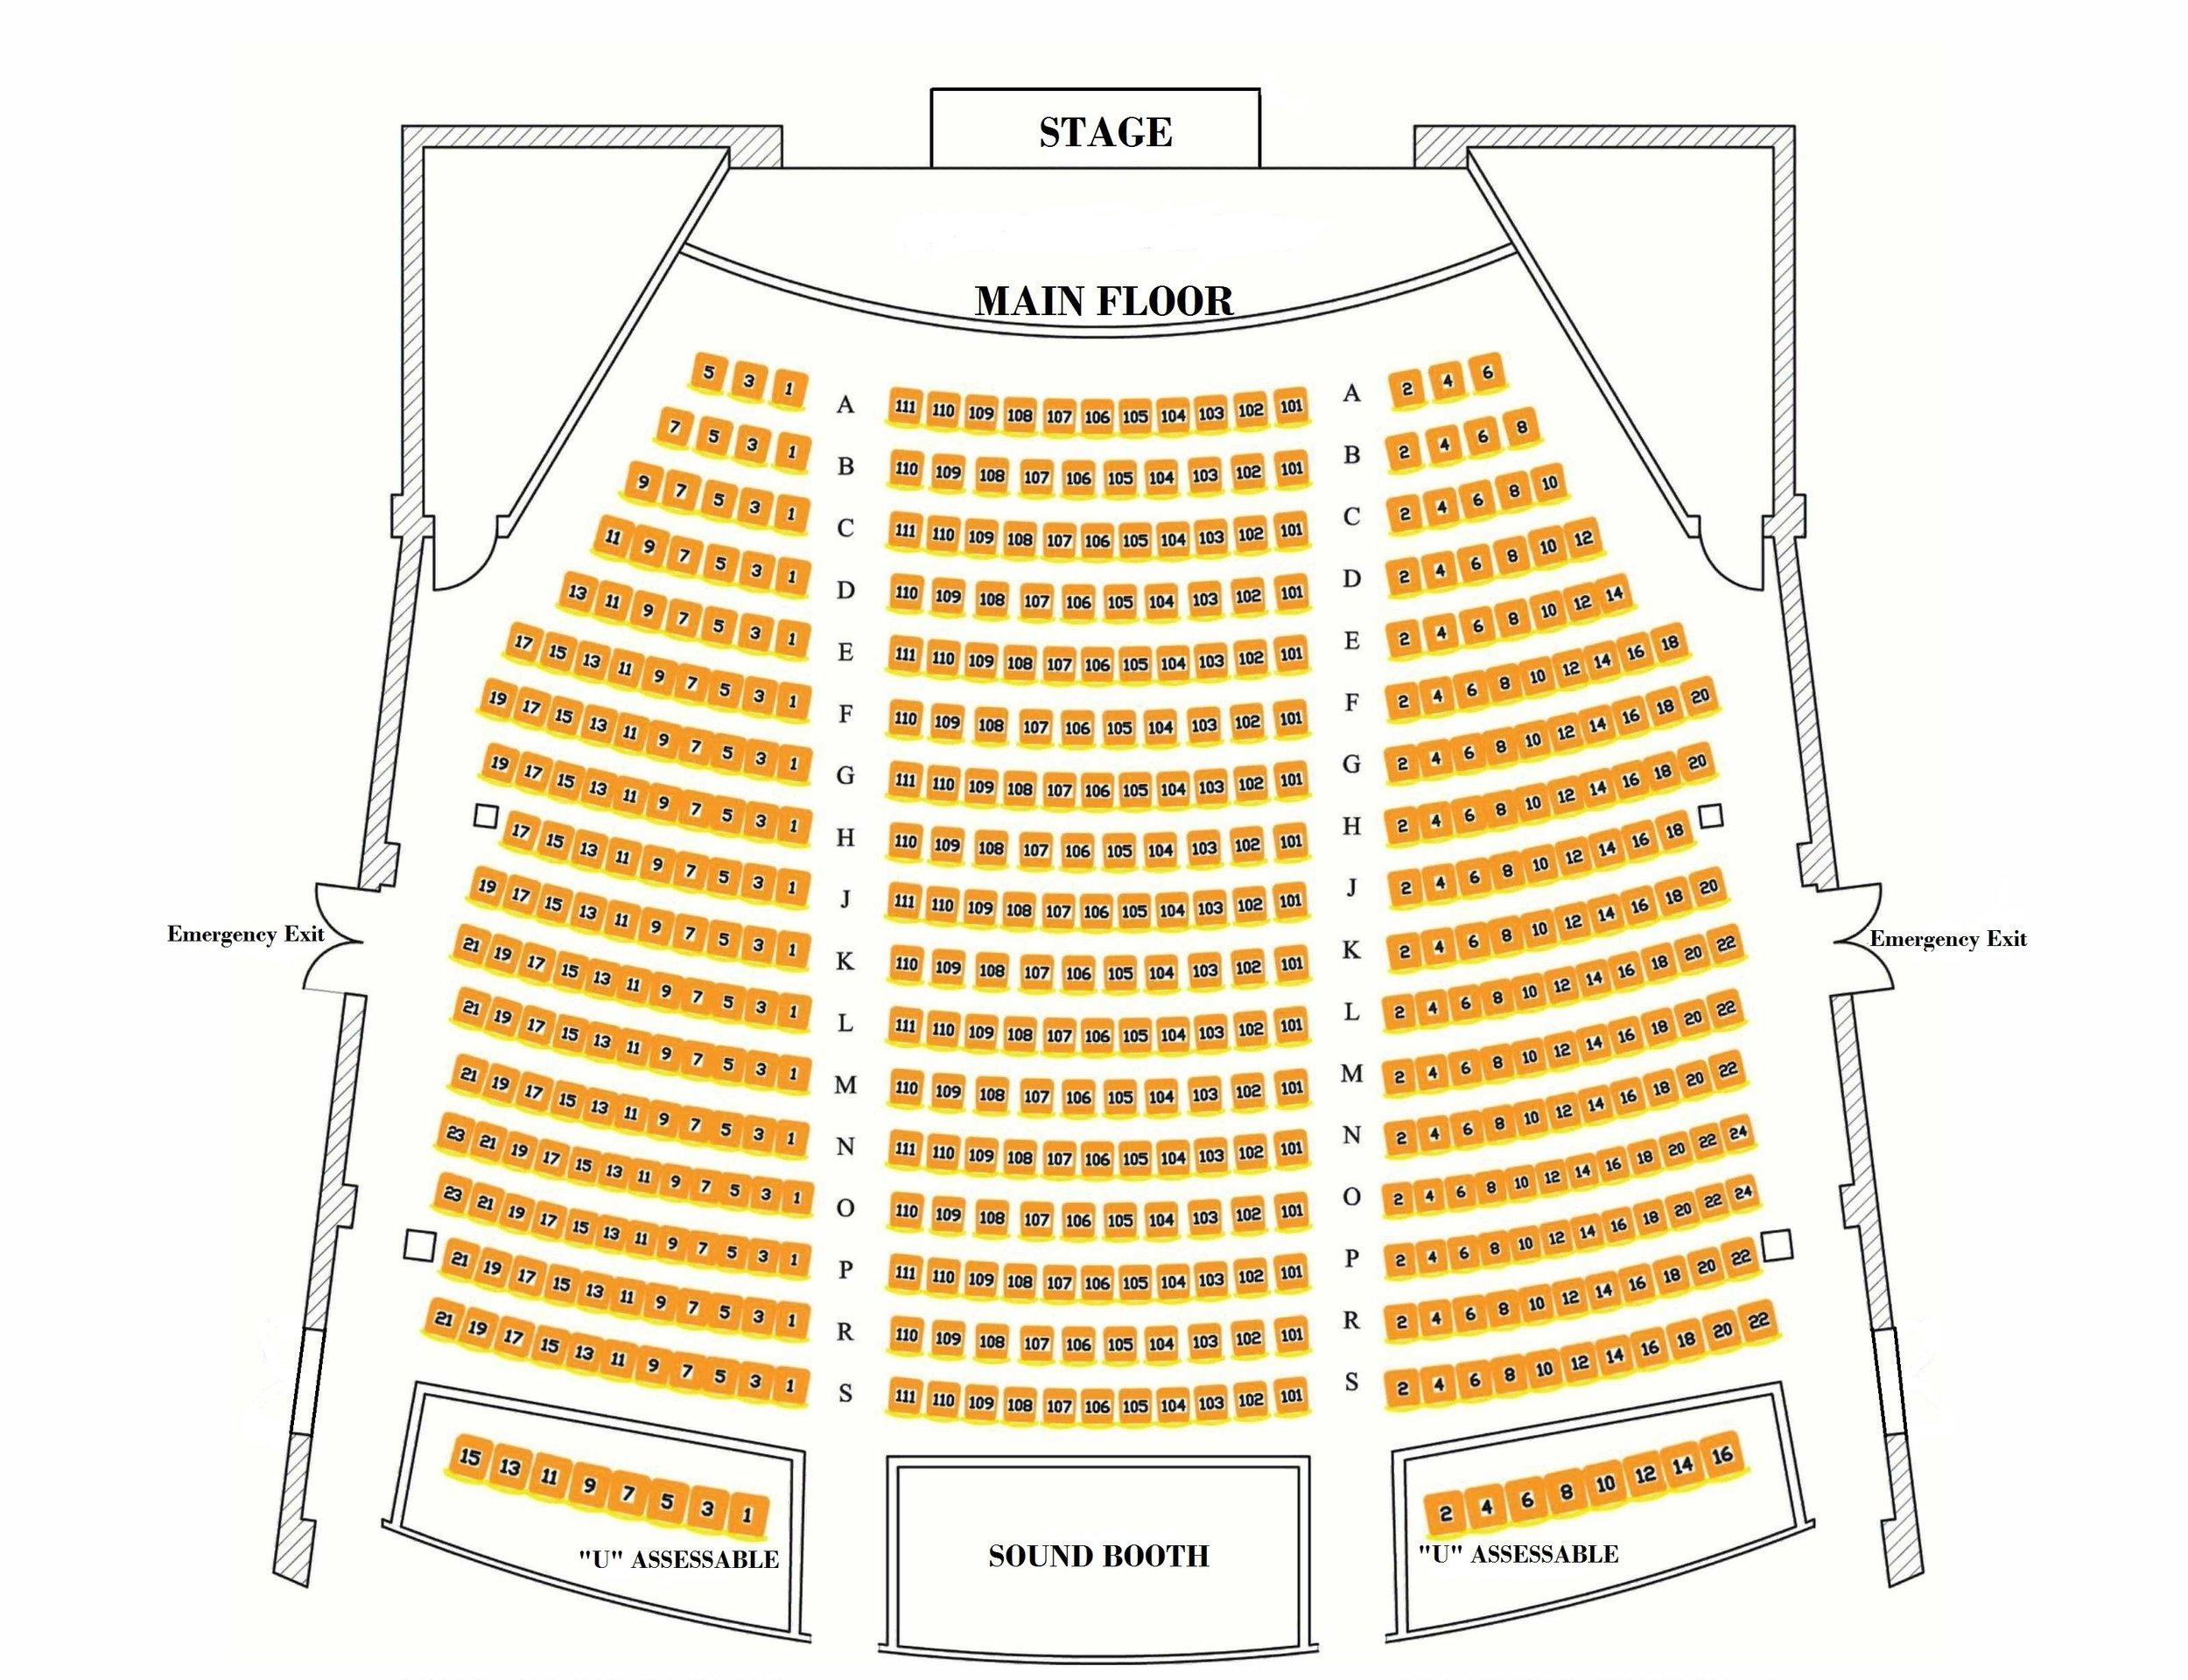 Seating chart main floor.jpg